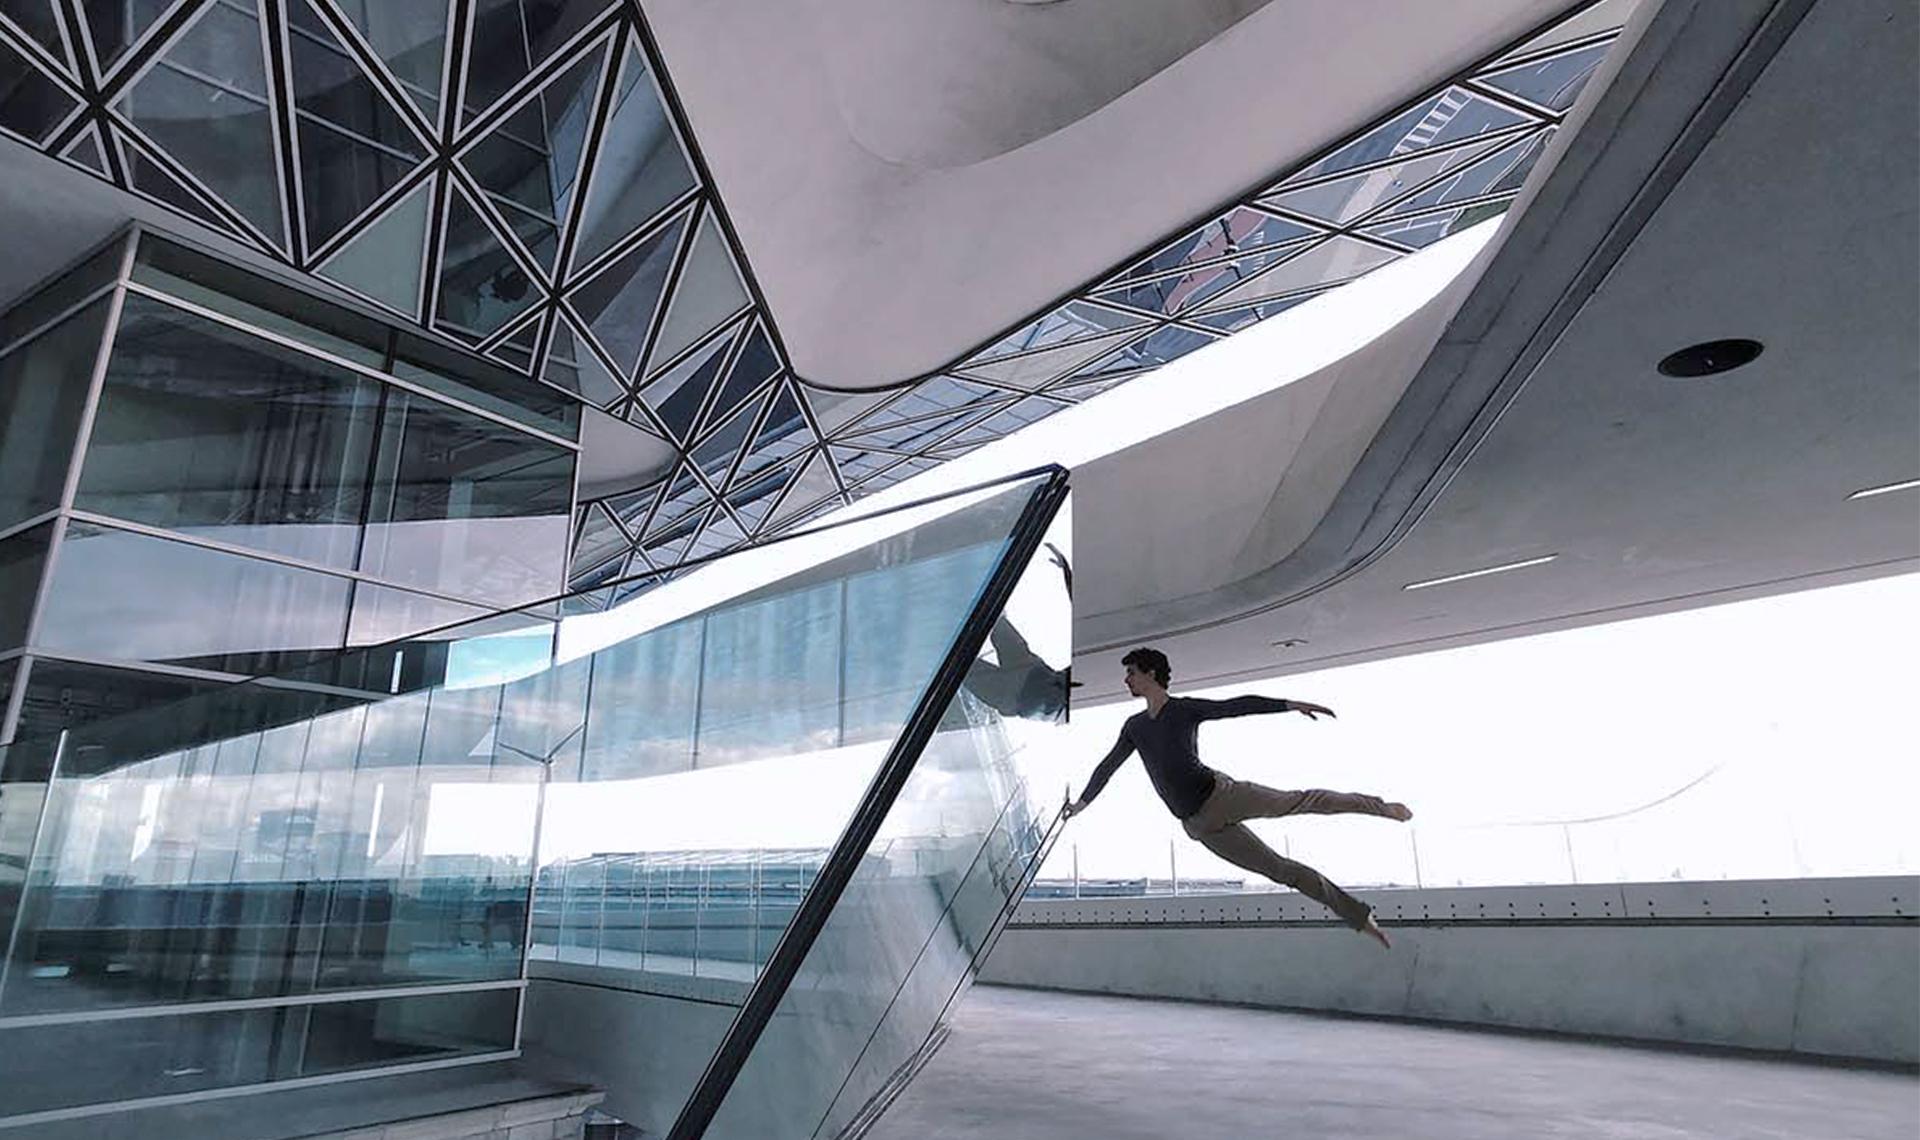 Танец на фоне архитектуры Захи Хадид